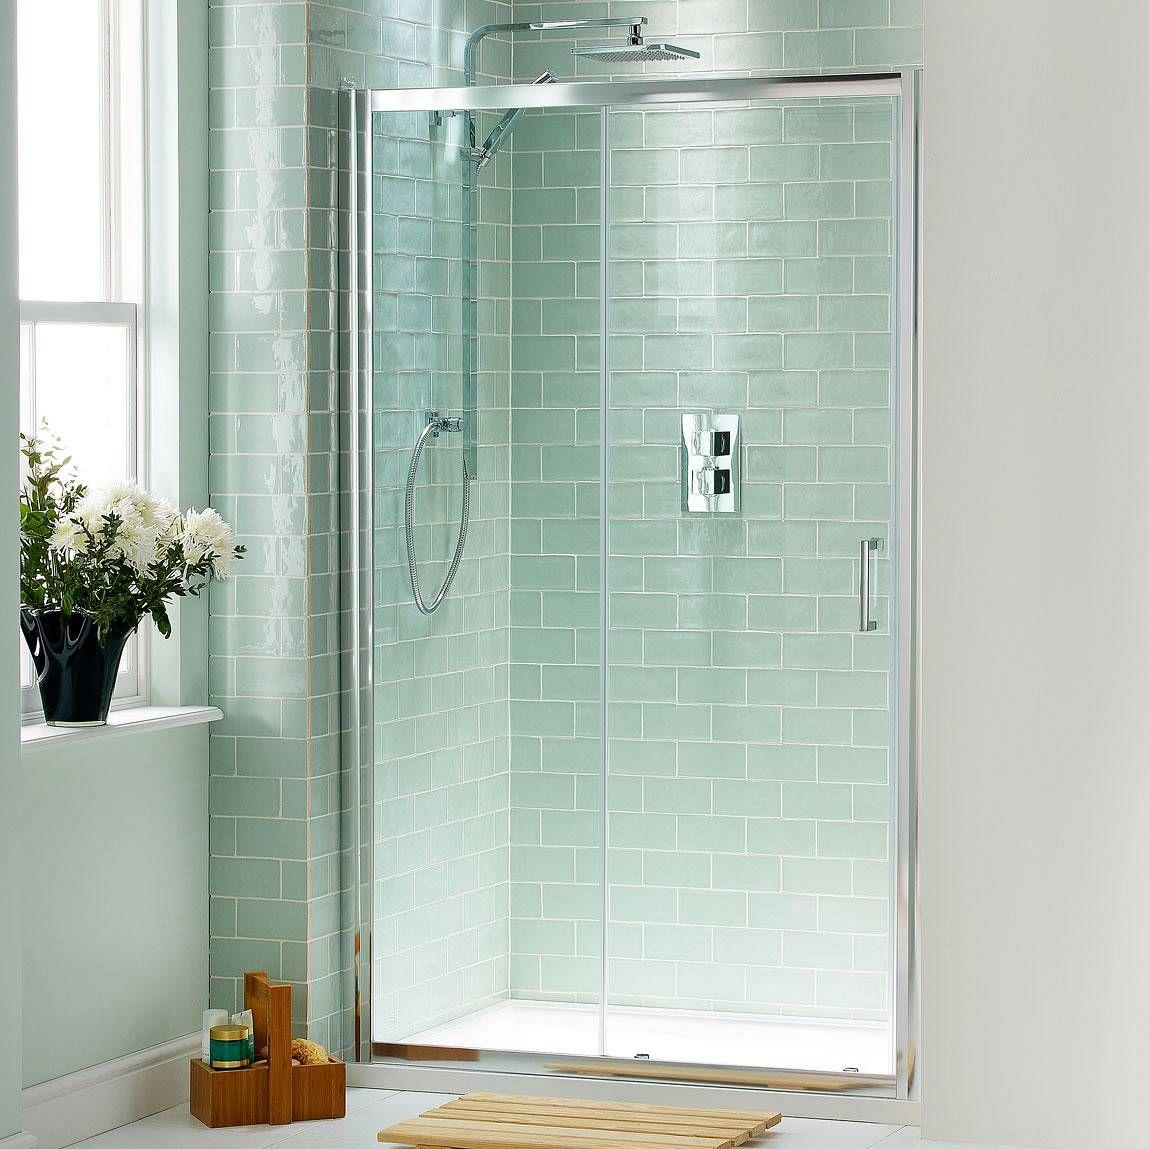 http://www.manufacturedhomerepairtips.com/showerdoorrepairoptions ...